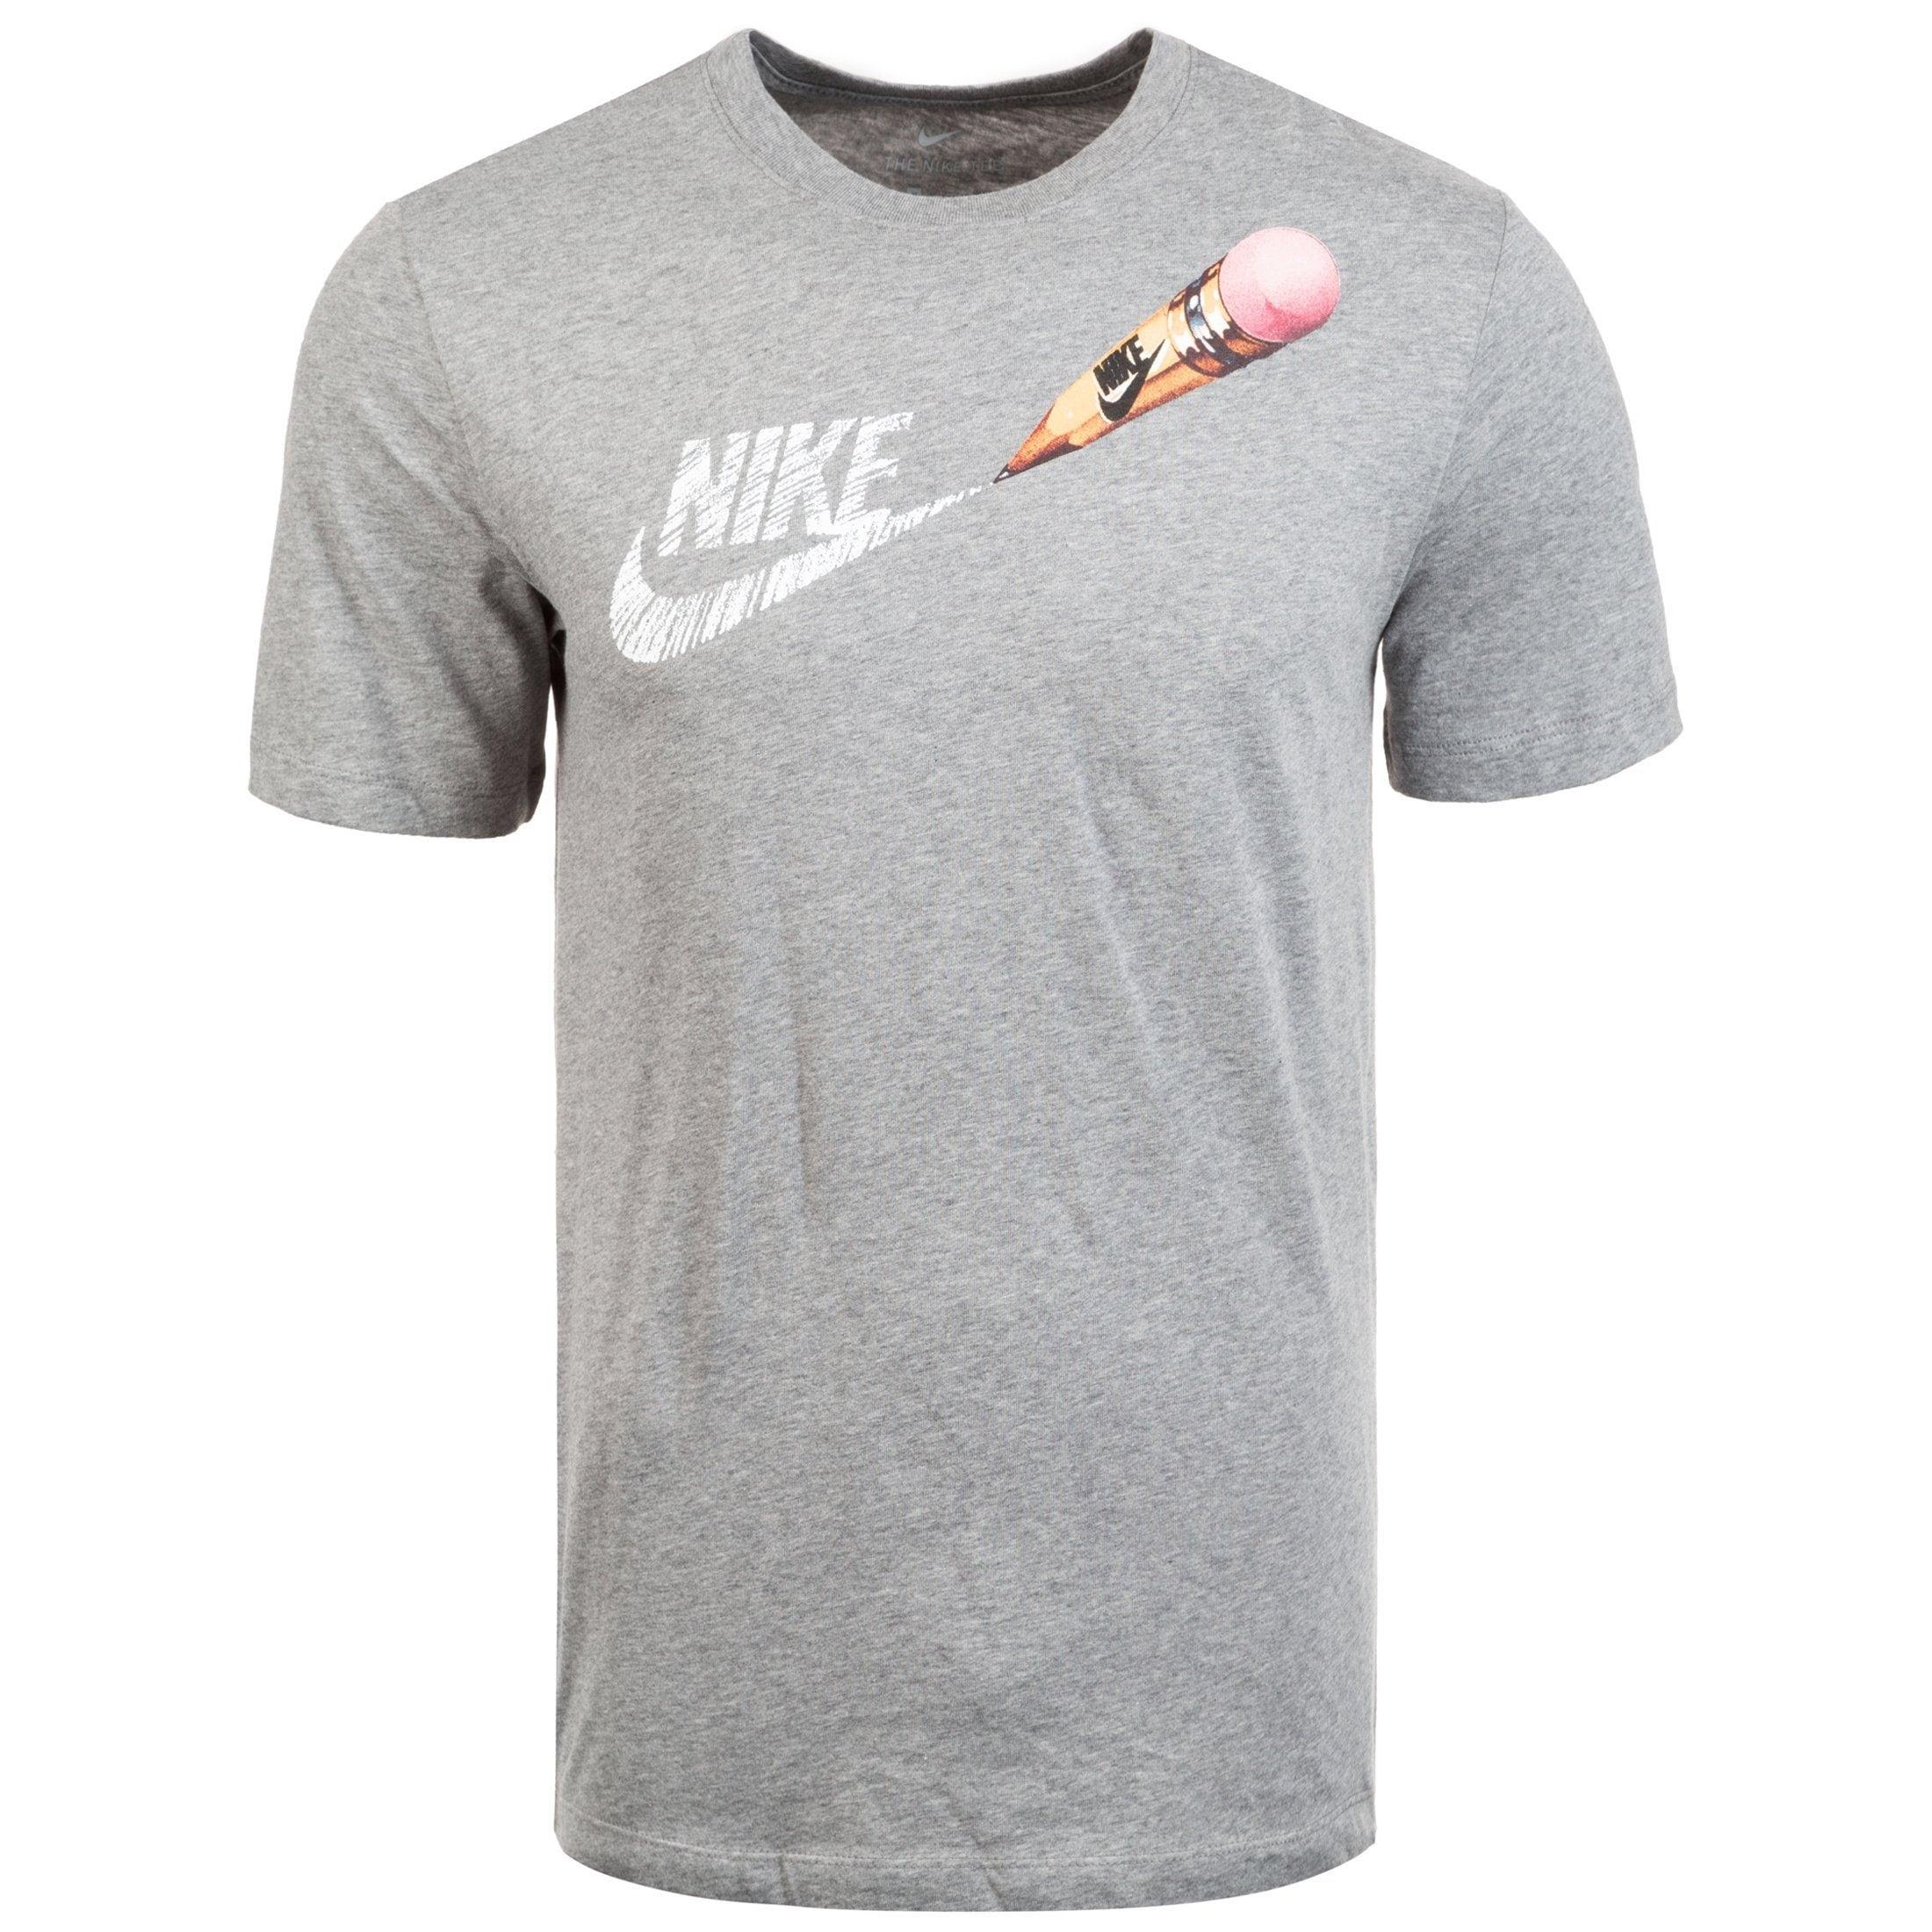 Nike Sportswear T-Shirt Remix 2 | Sportbekleidung > Sportshirts > T-Shirts | Grau | Nike Sportswear